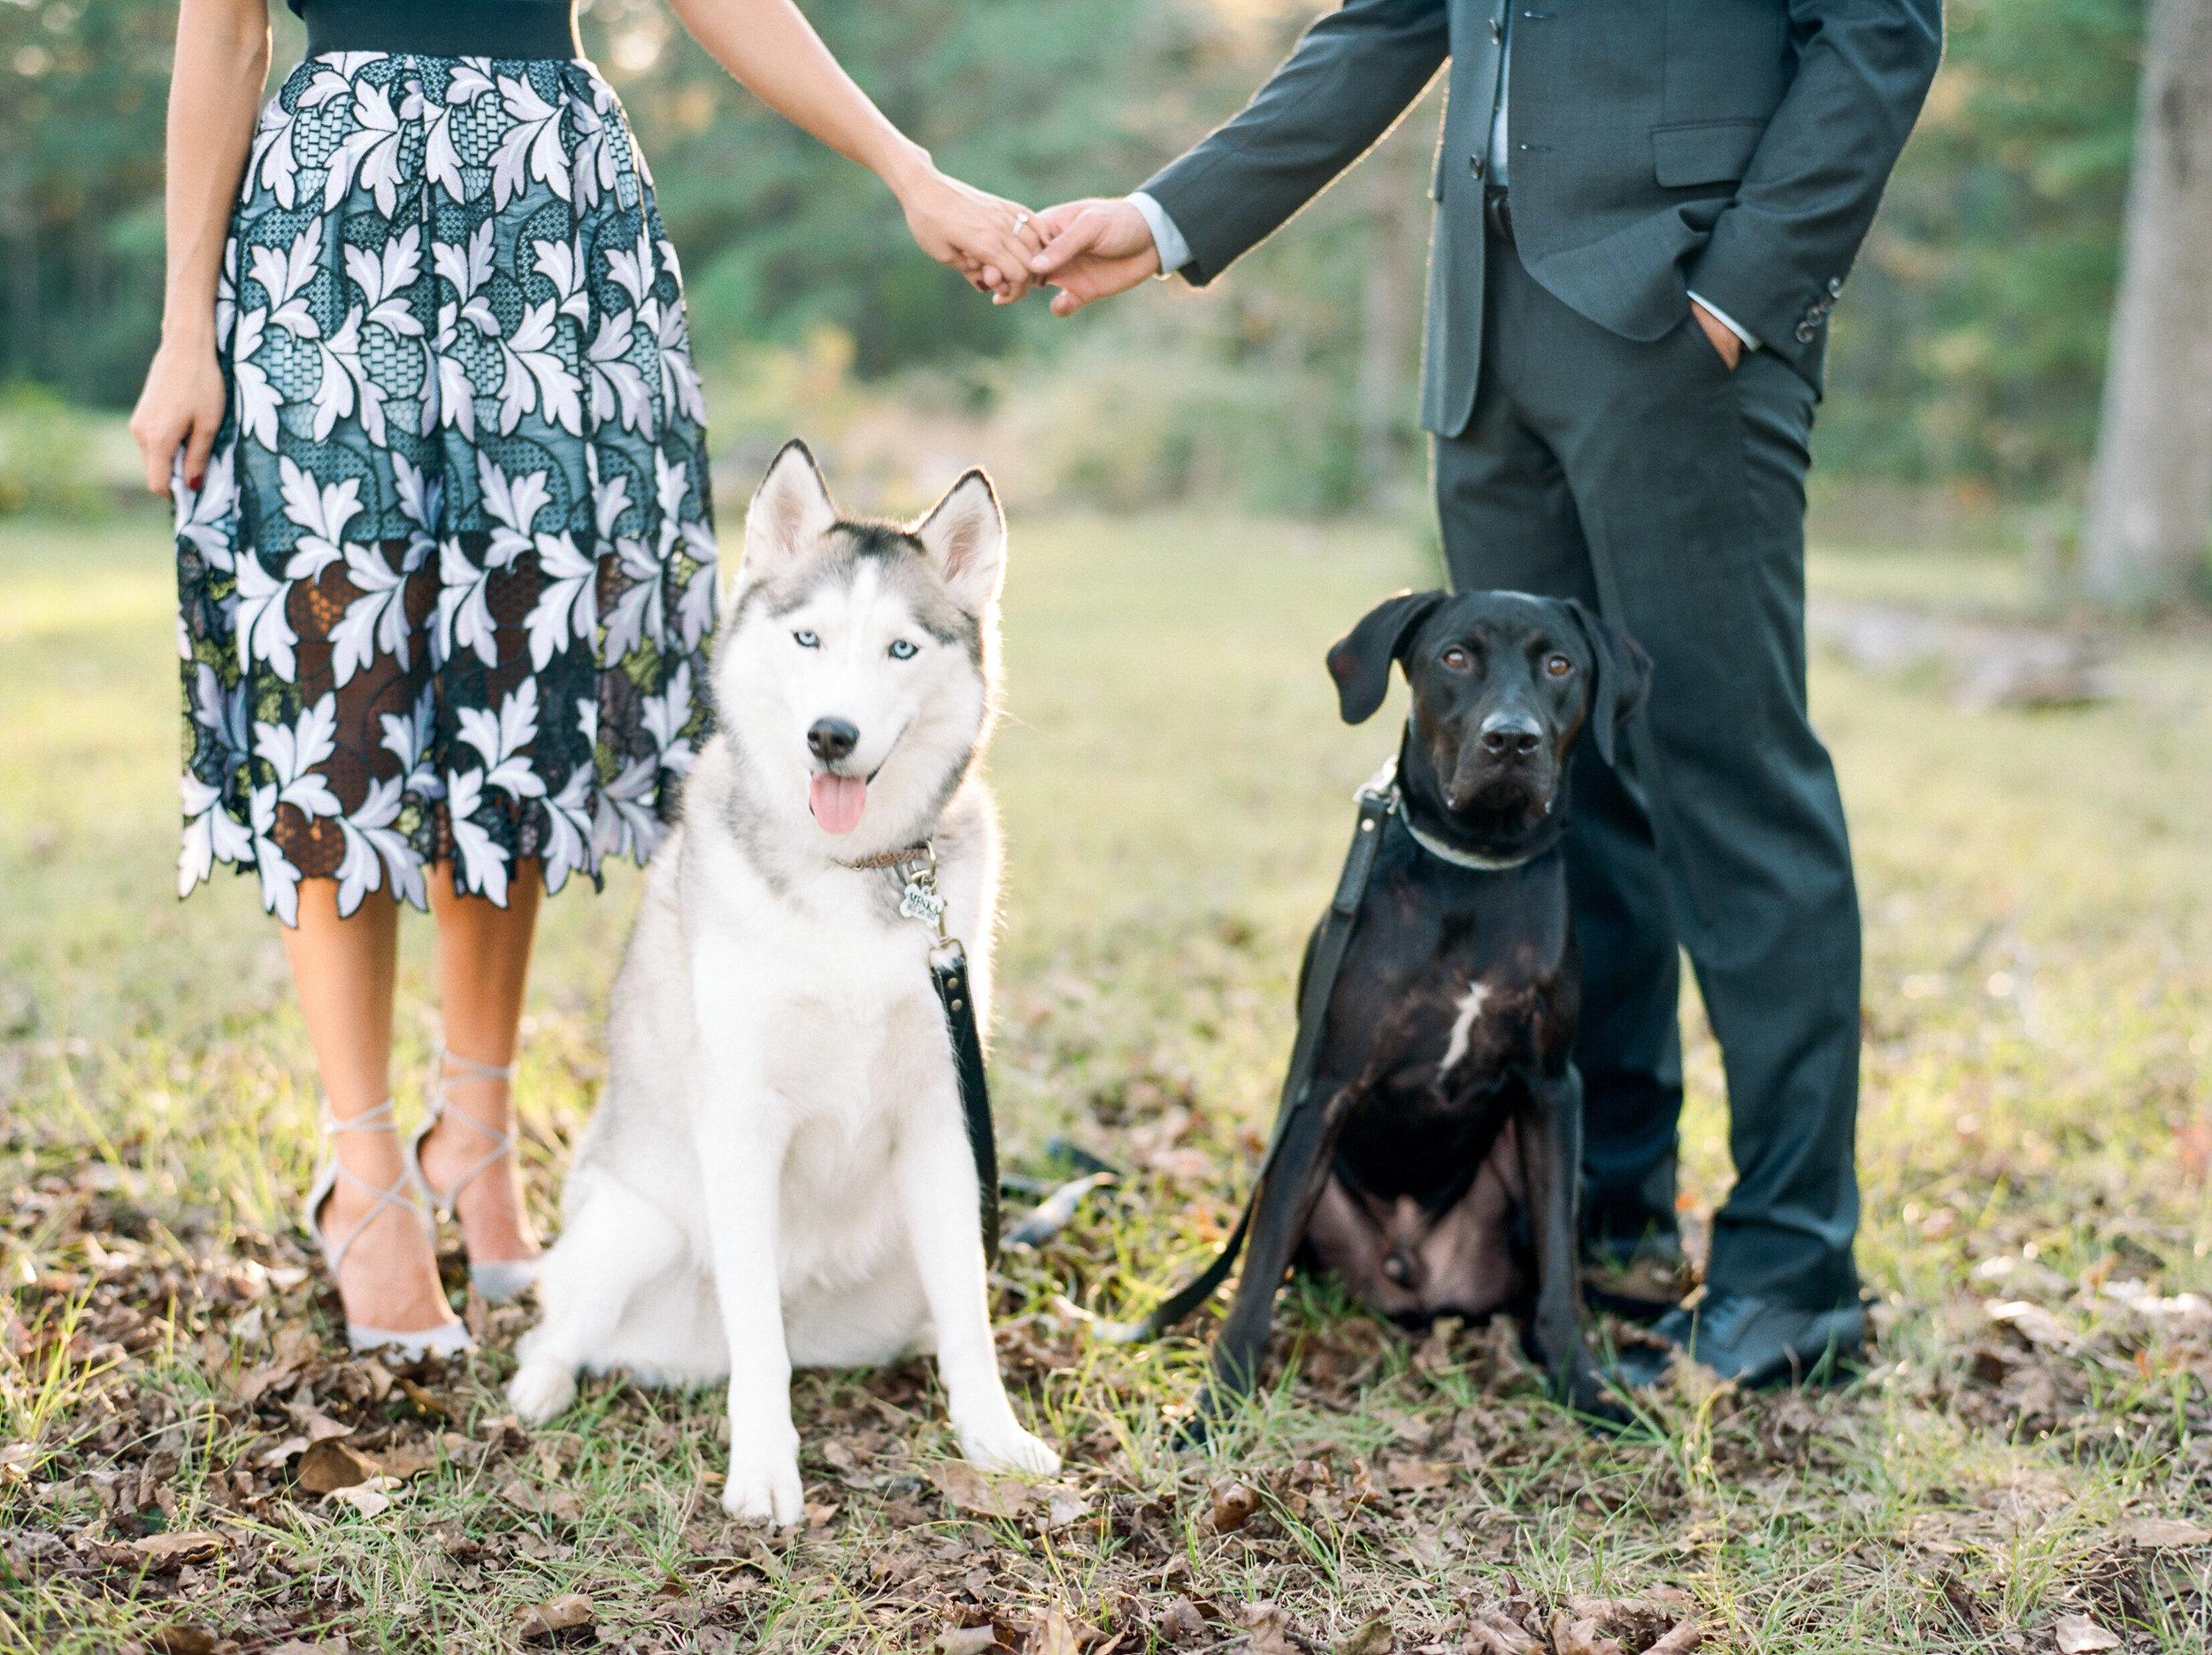 dana-fernandez-photography-houston-portrait-photographer-wedding-engagements-lance-kara-mccullers-houston-astros-film-photographer-9.jpg